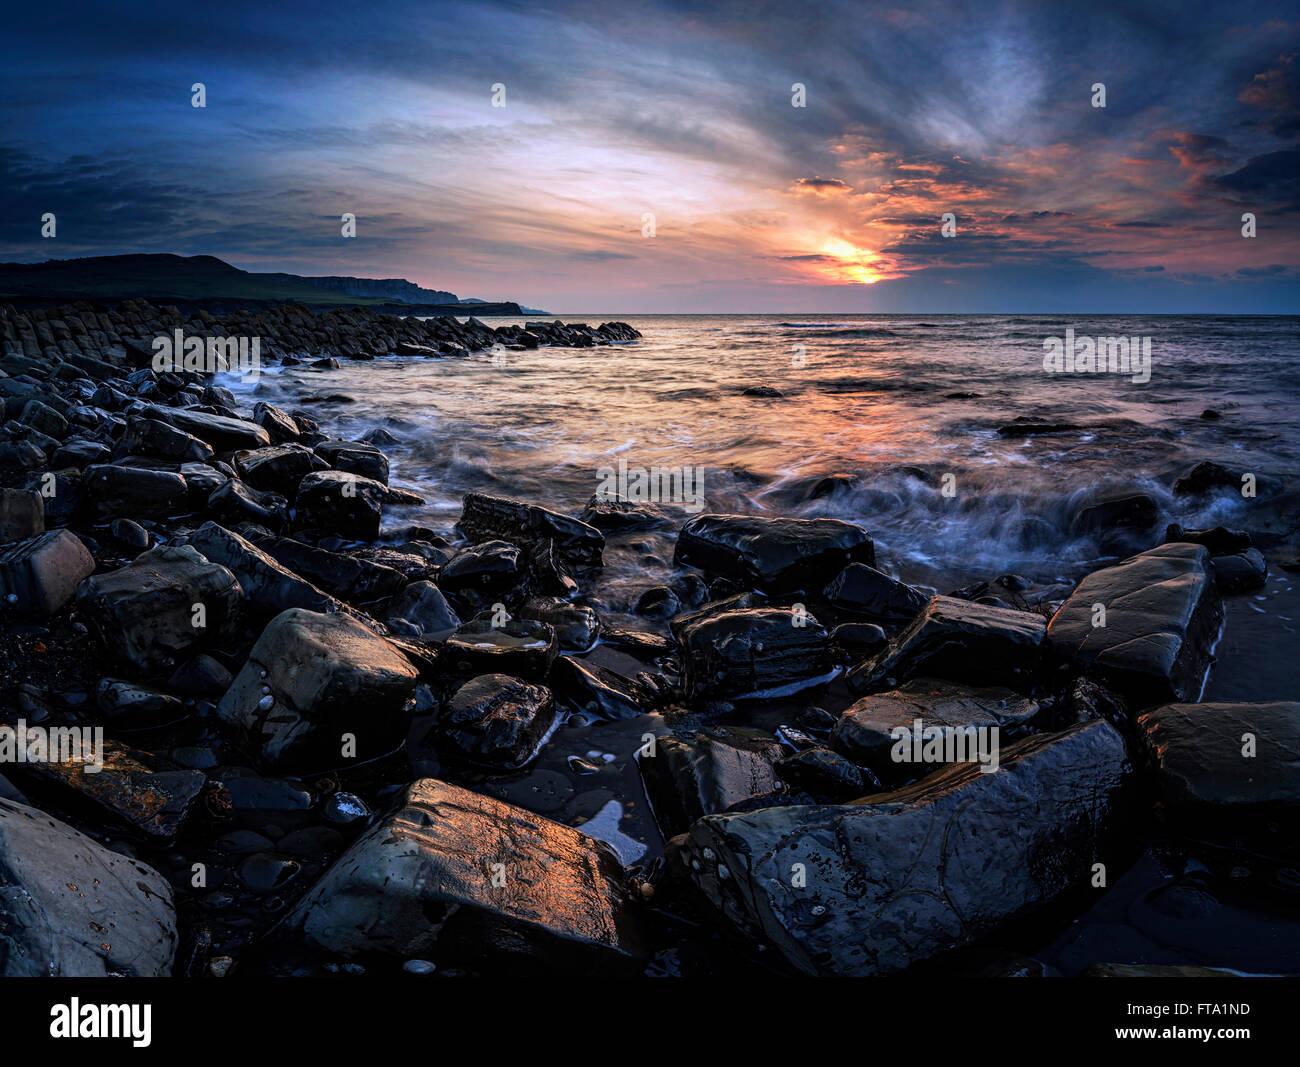 Stunning sunset landscape image of rocky coastline in Dorset England - Stock Image